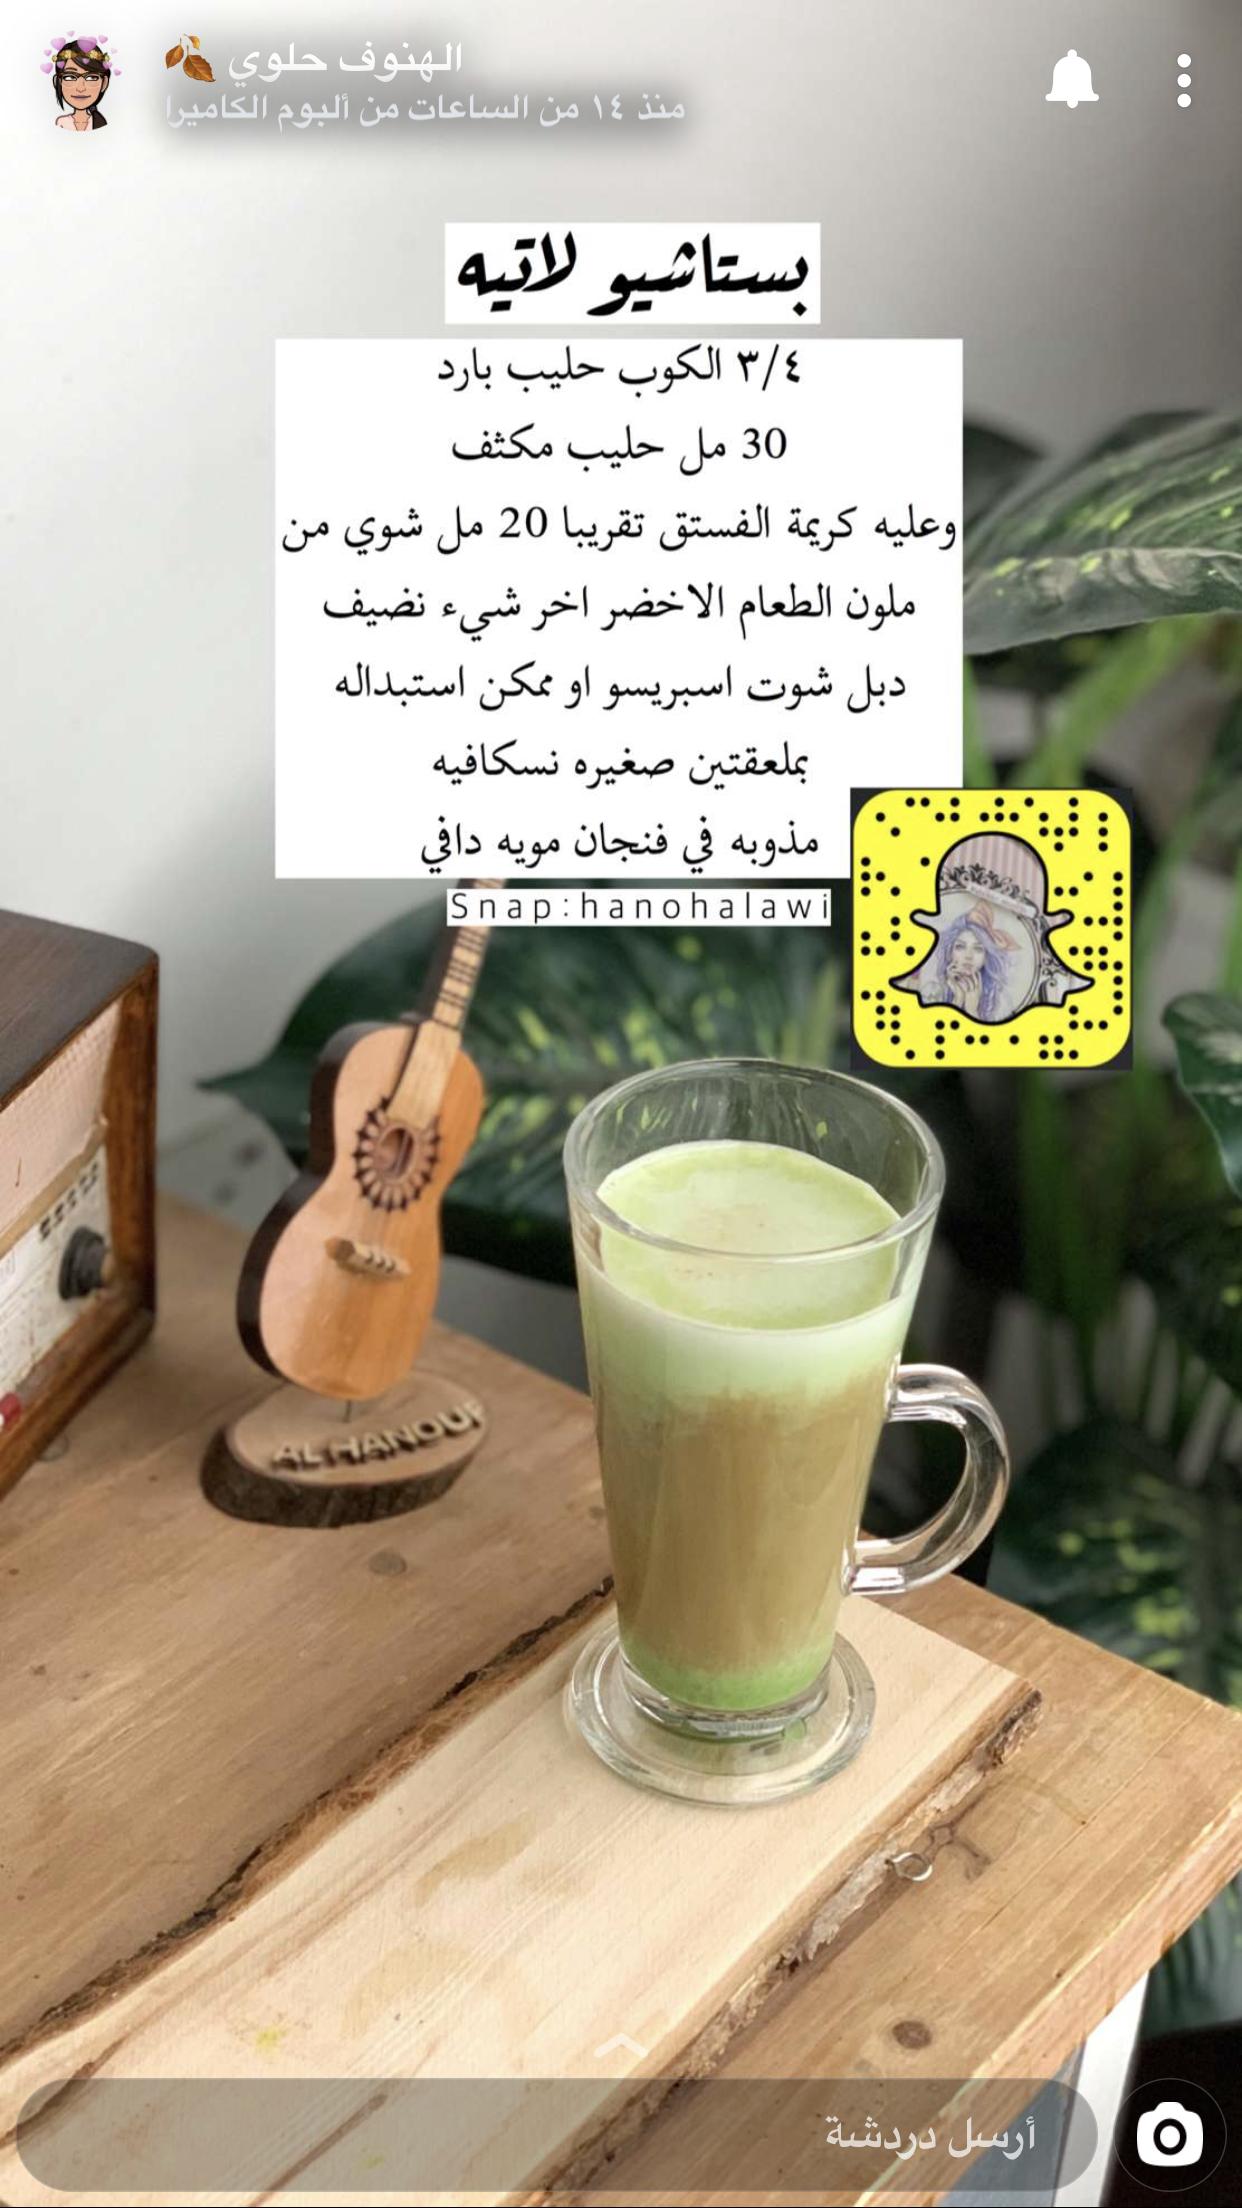 Pin By Wafa On مشروبآت حآرة وبآردة Coffee Drink Recipes Cafe Food Ice Coffee Recipe